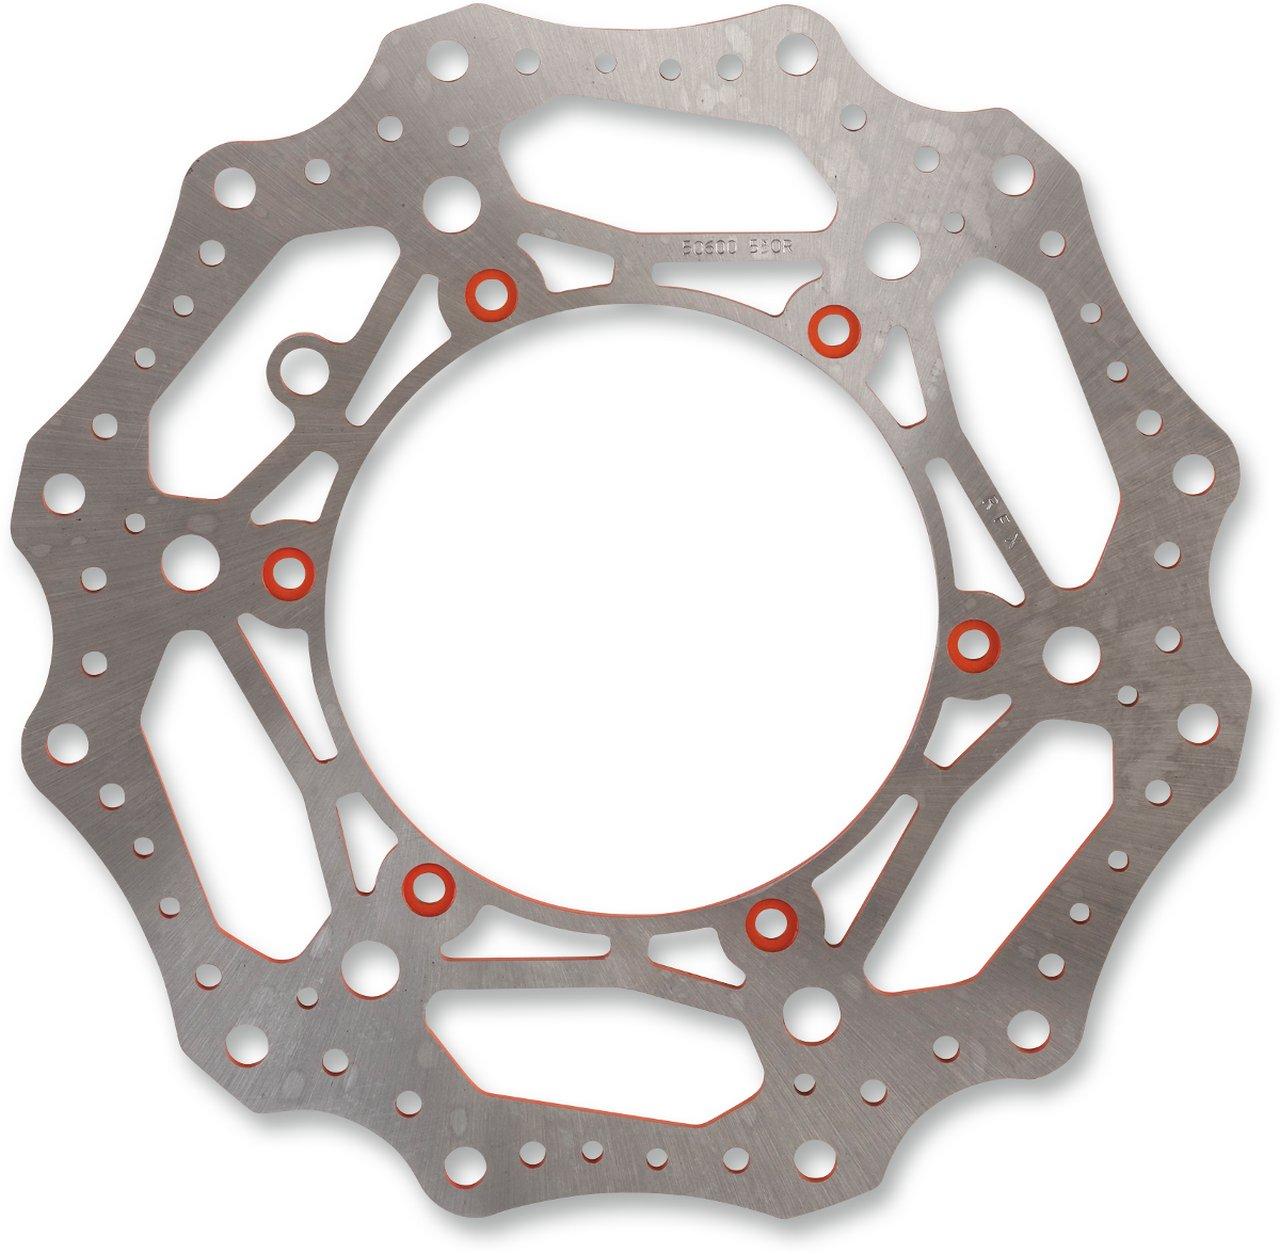 【MOOSE RACING】RFX 煞車碟盤 [1711-1383] - 「Webike-摩托百貨」